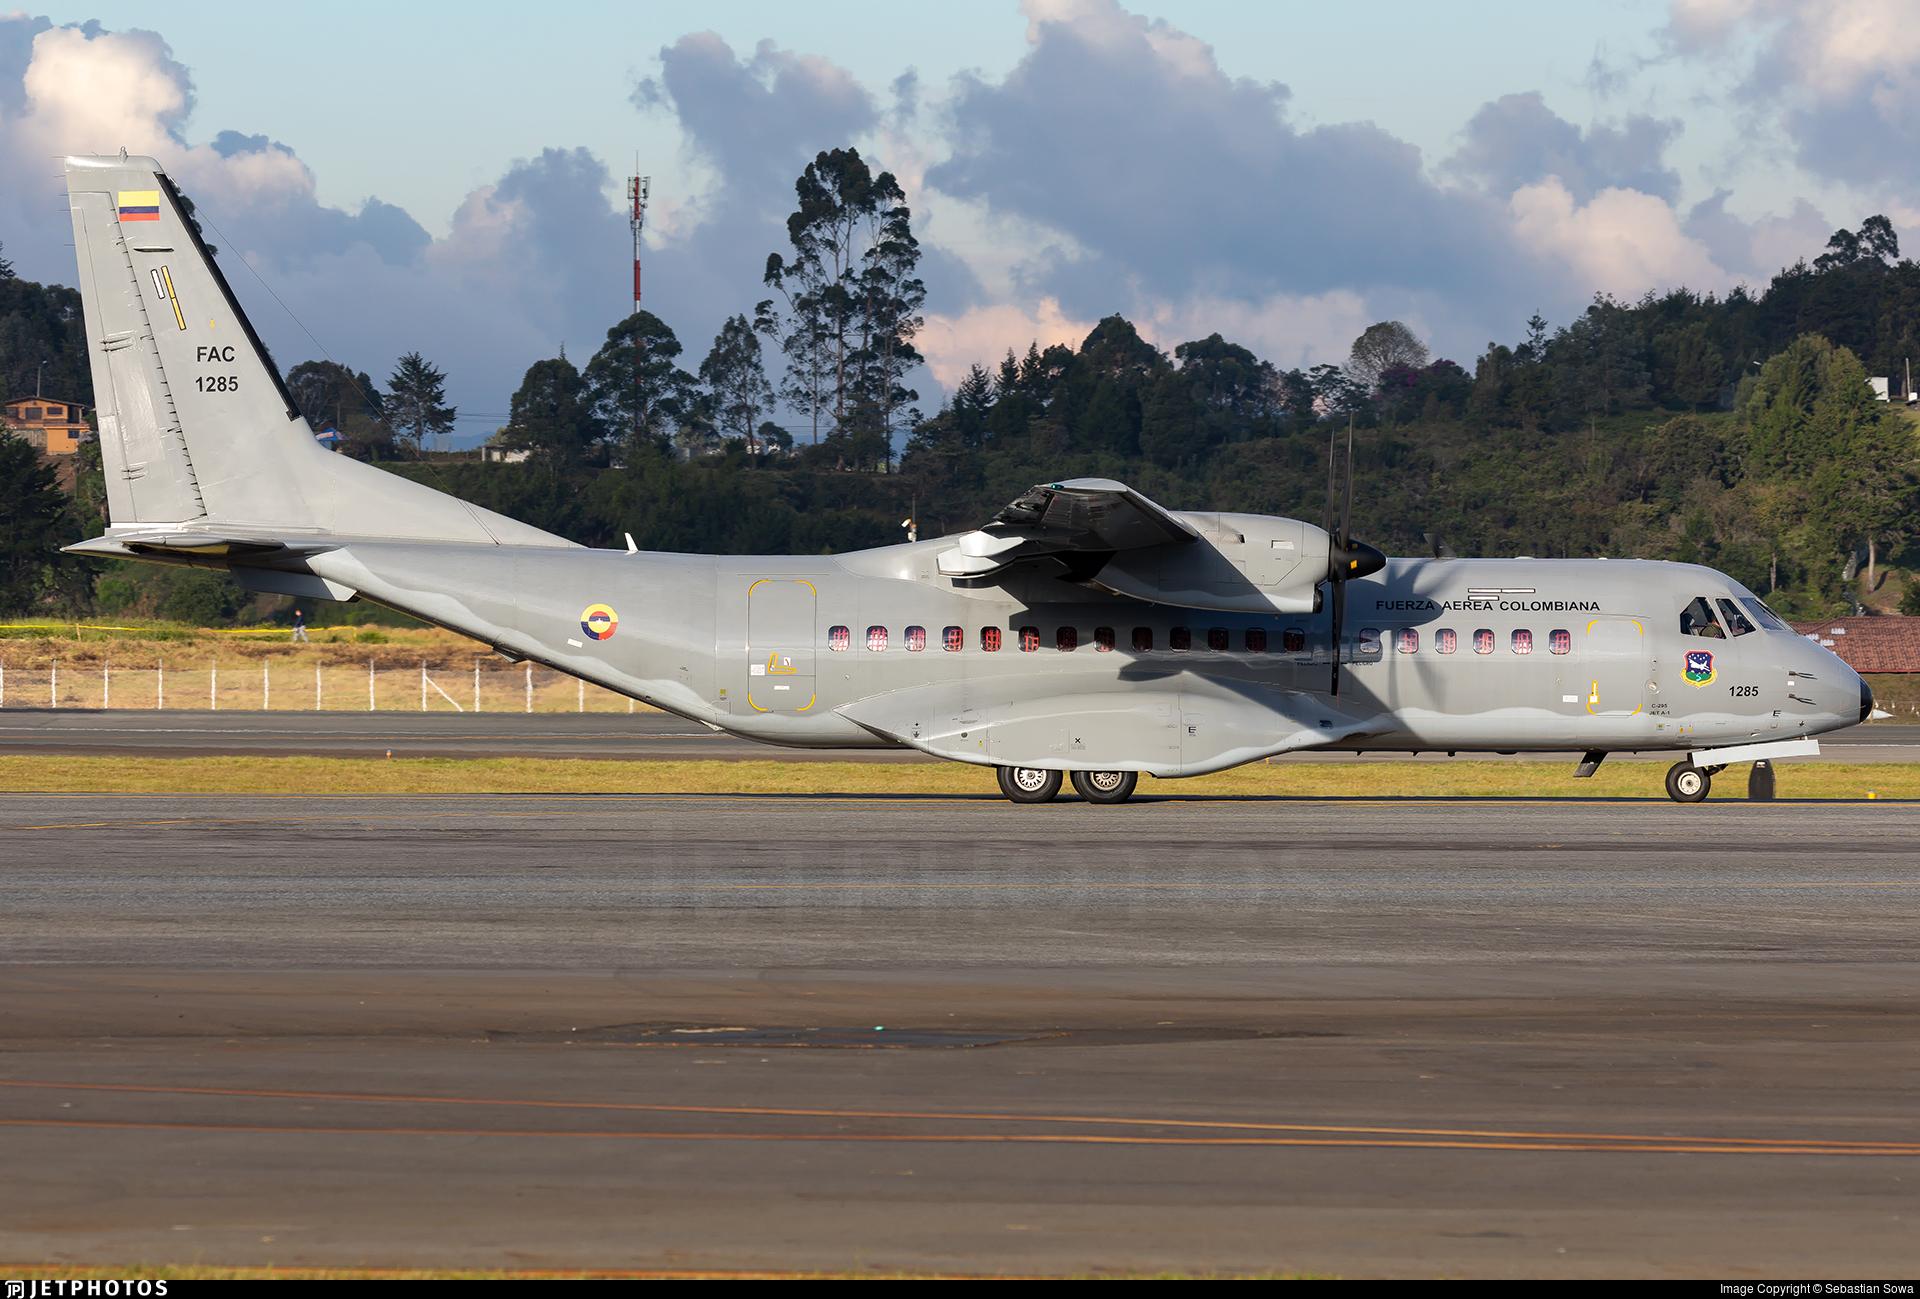 FAC1285 - CASA C-295M - Colombia - Air Force